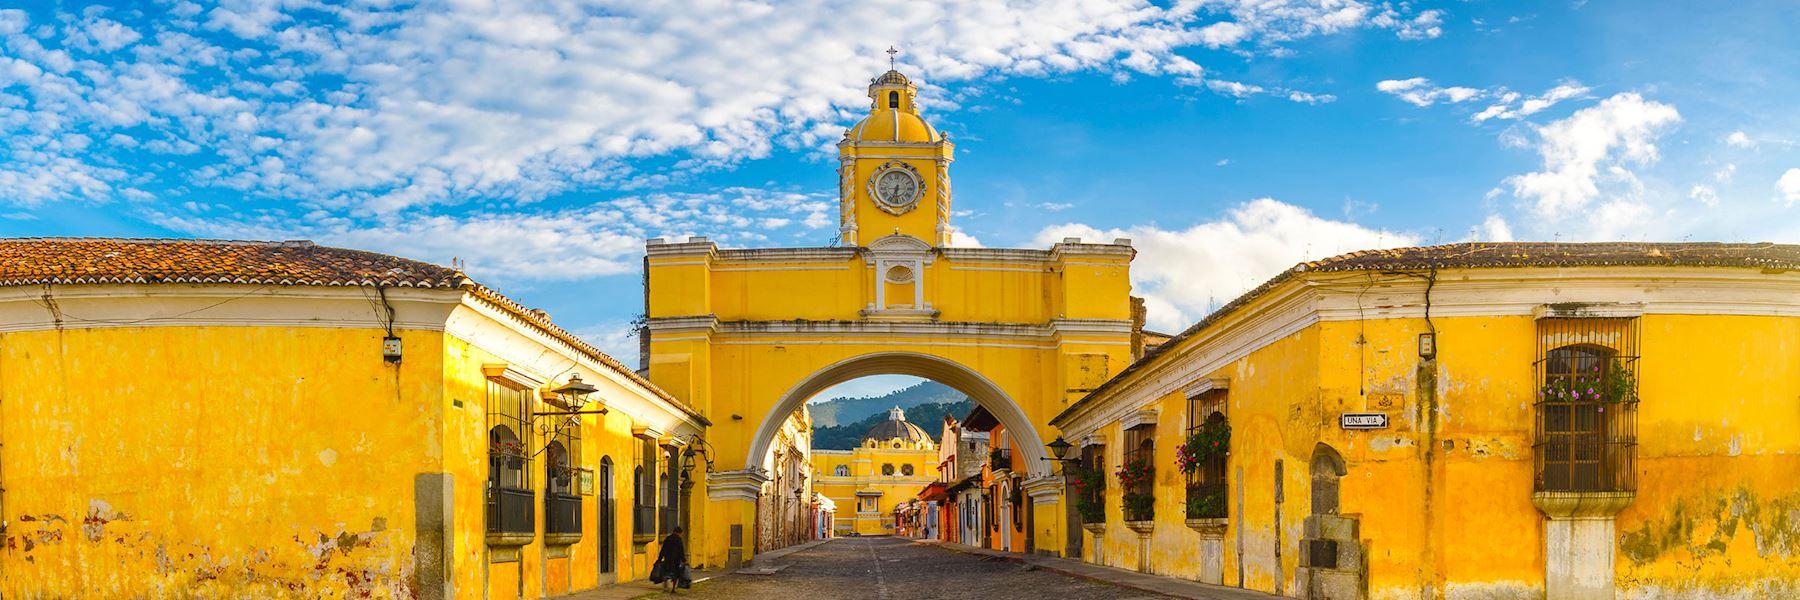 Visit Antigua, Guatemala